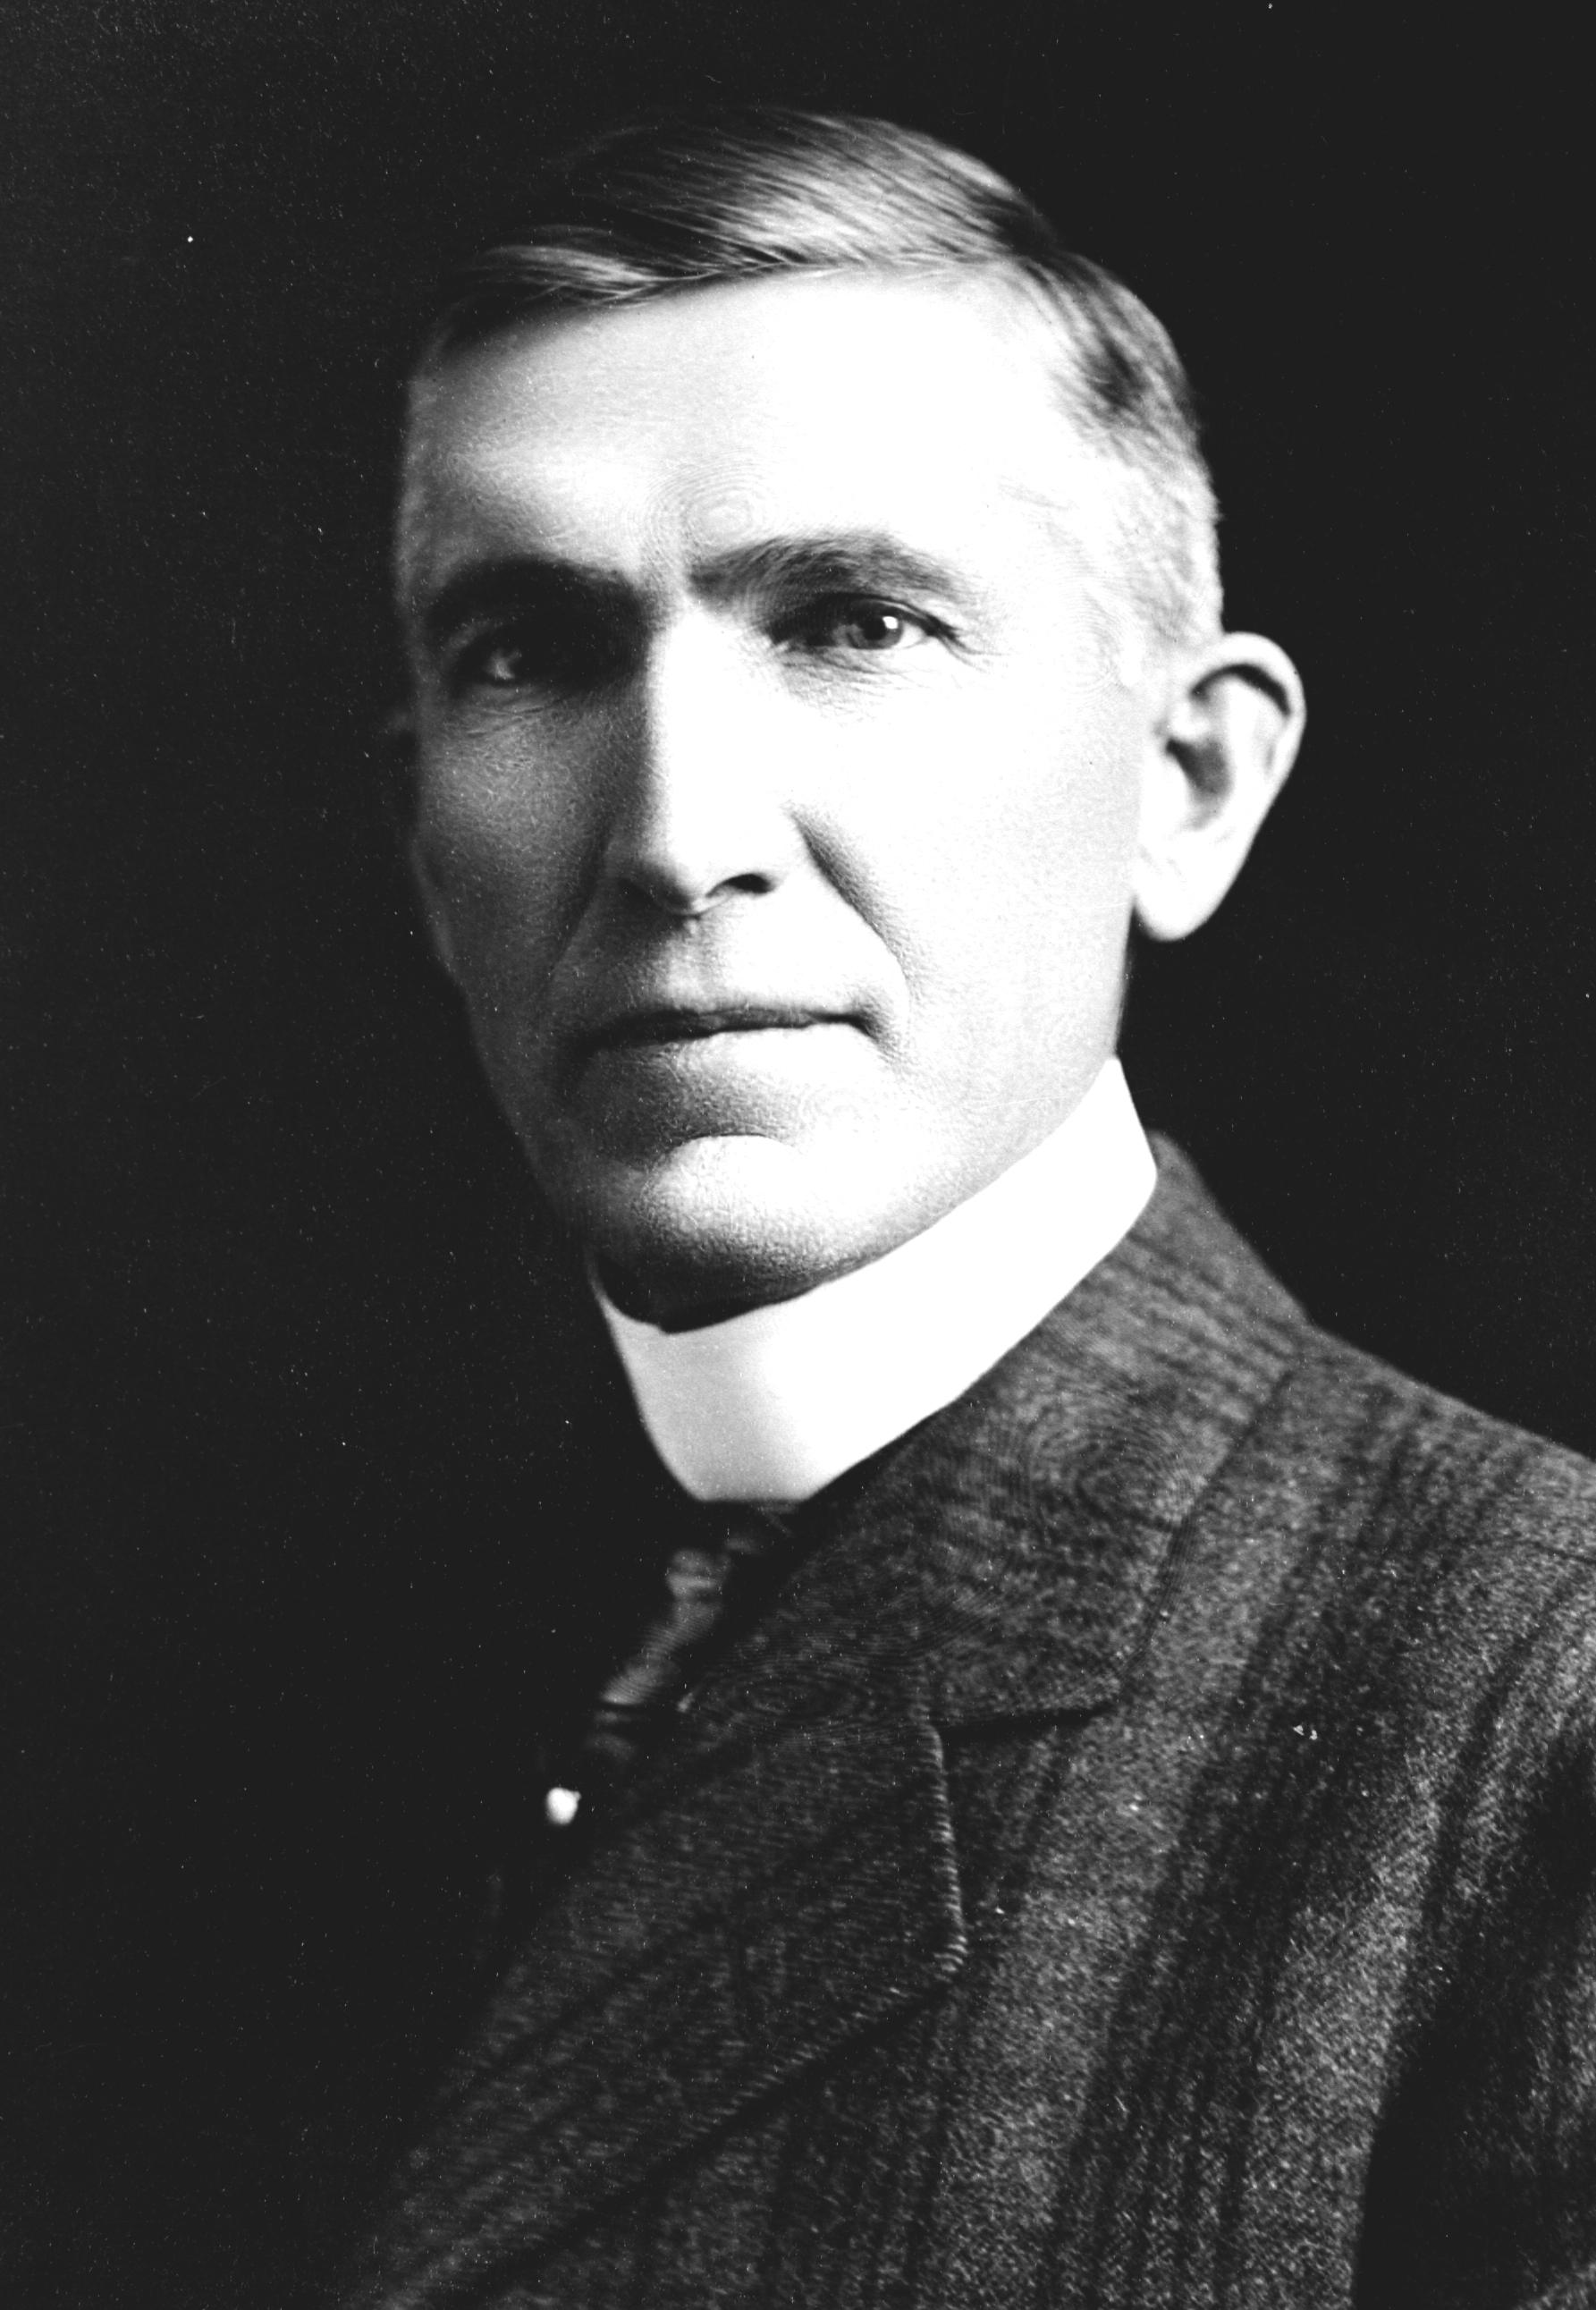 George A. Hormel